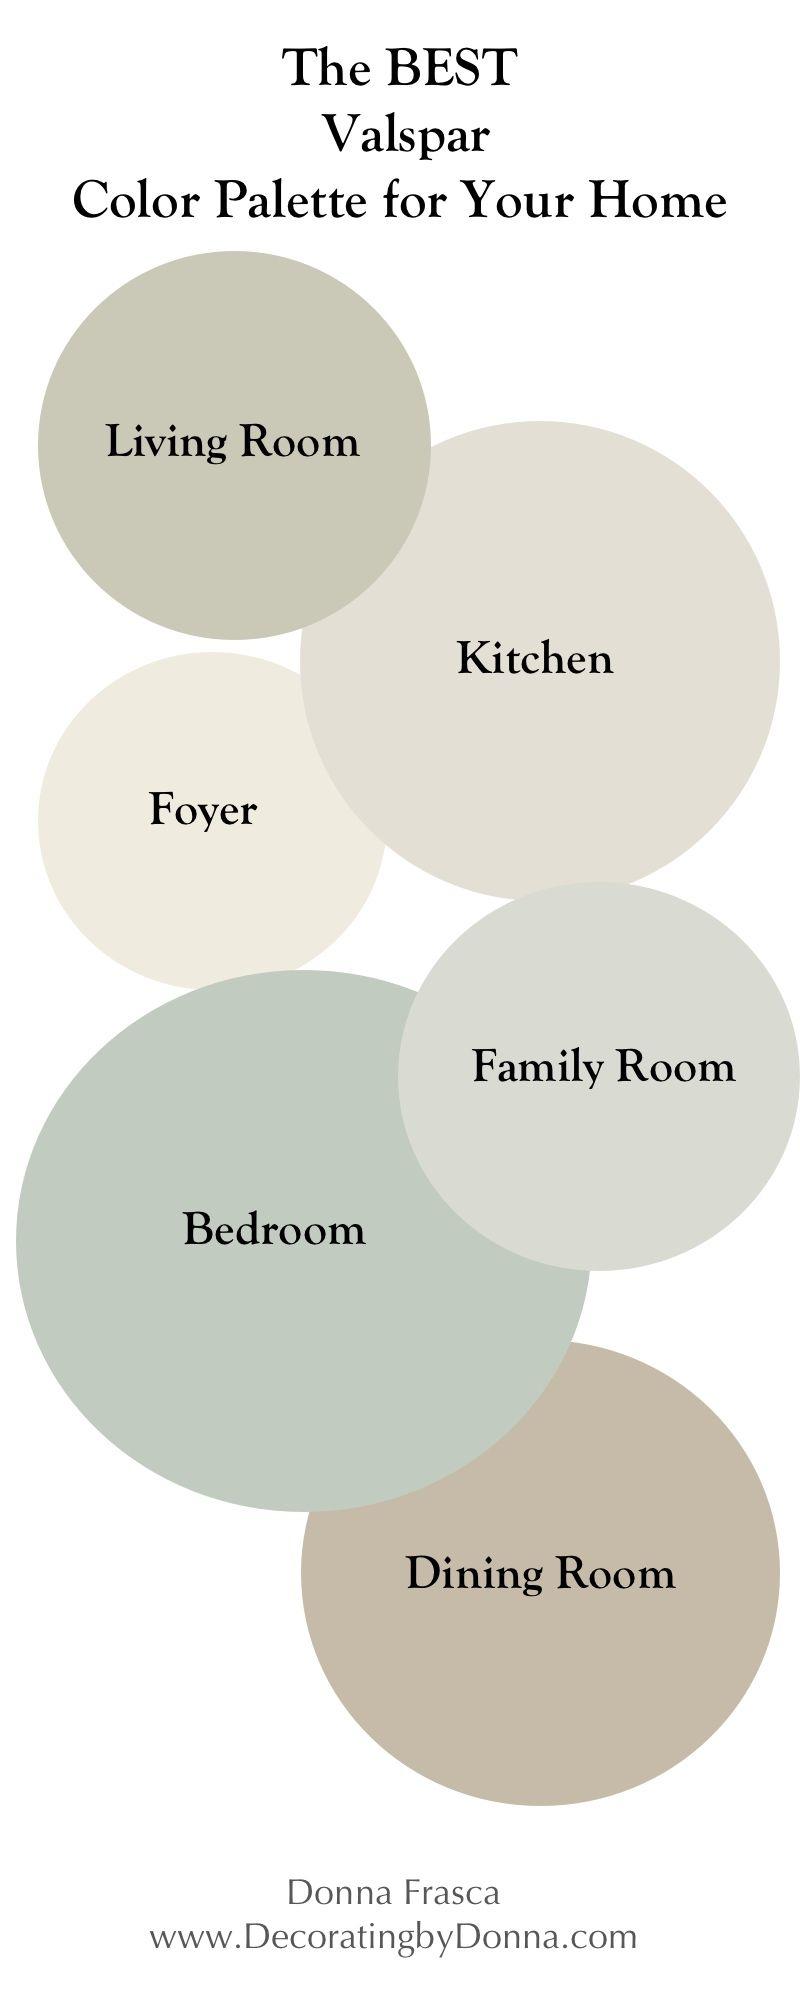 The Best Valspar Color Palette For Your Home Valspar Colors Paint Colors For Home Living Room Colors